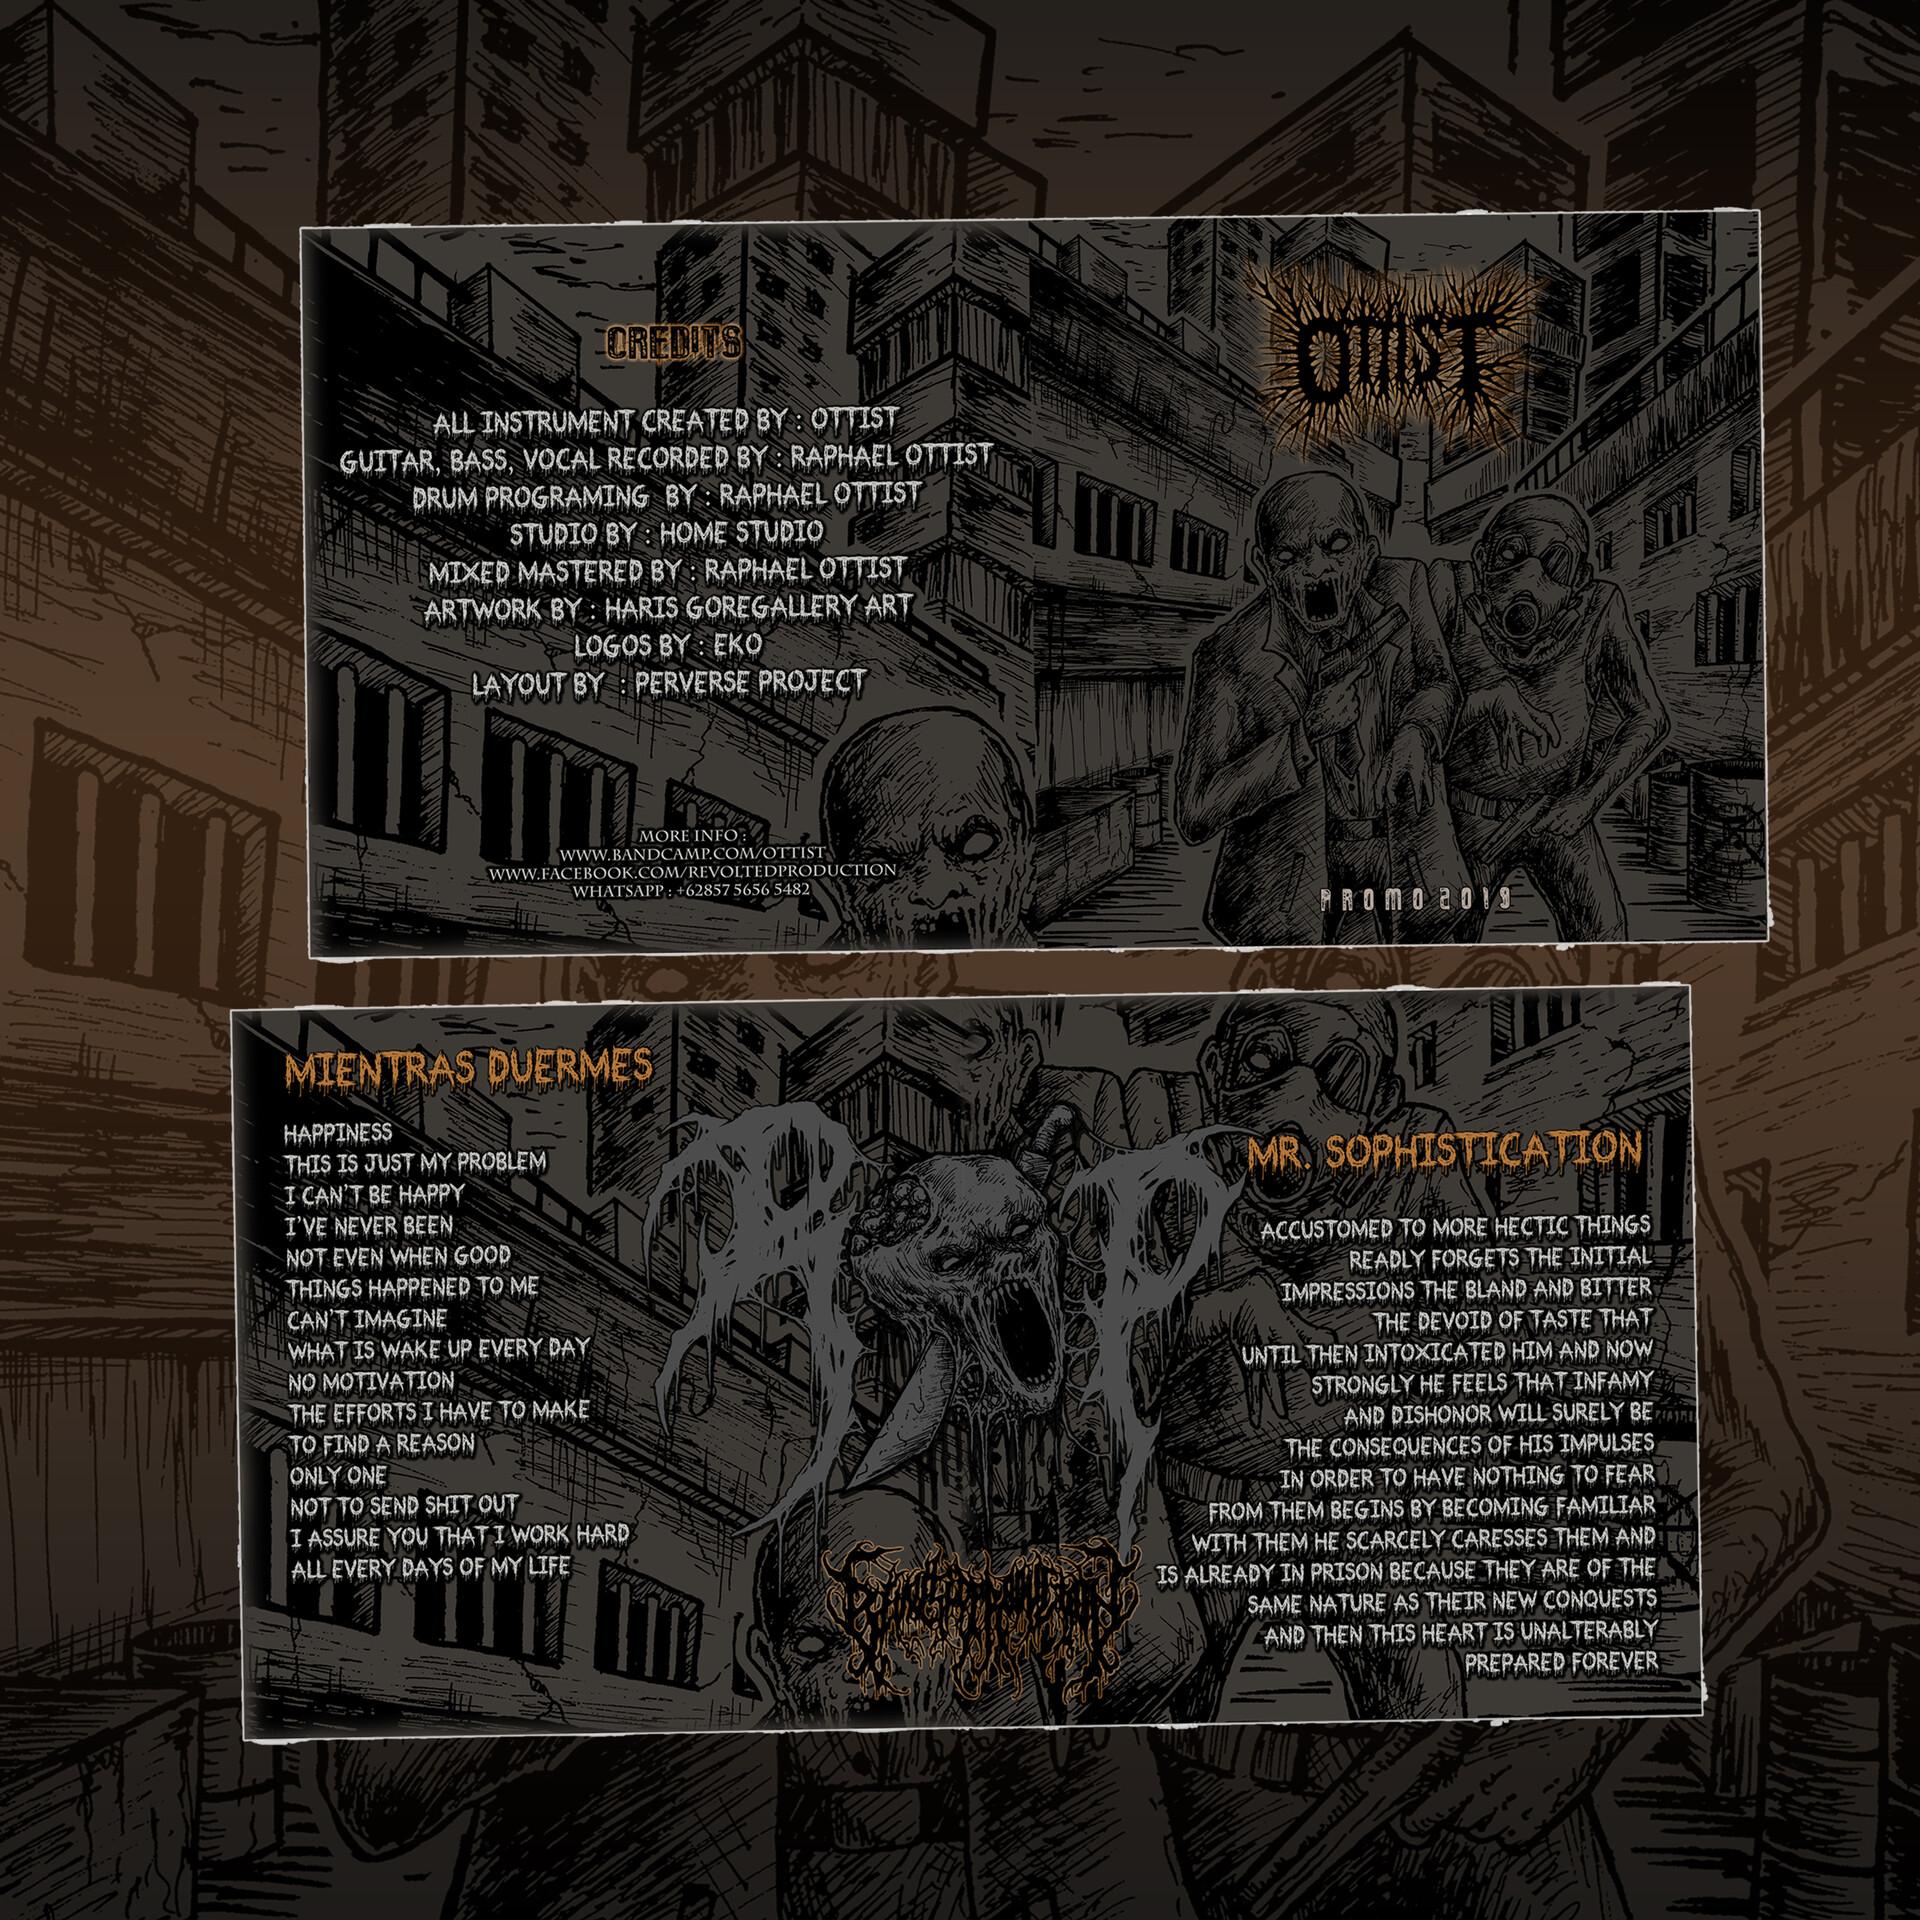 ArtStation - OTTIS T (BRAZIL) - PROMO 2019, Perverse Project